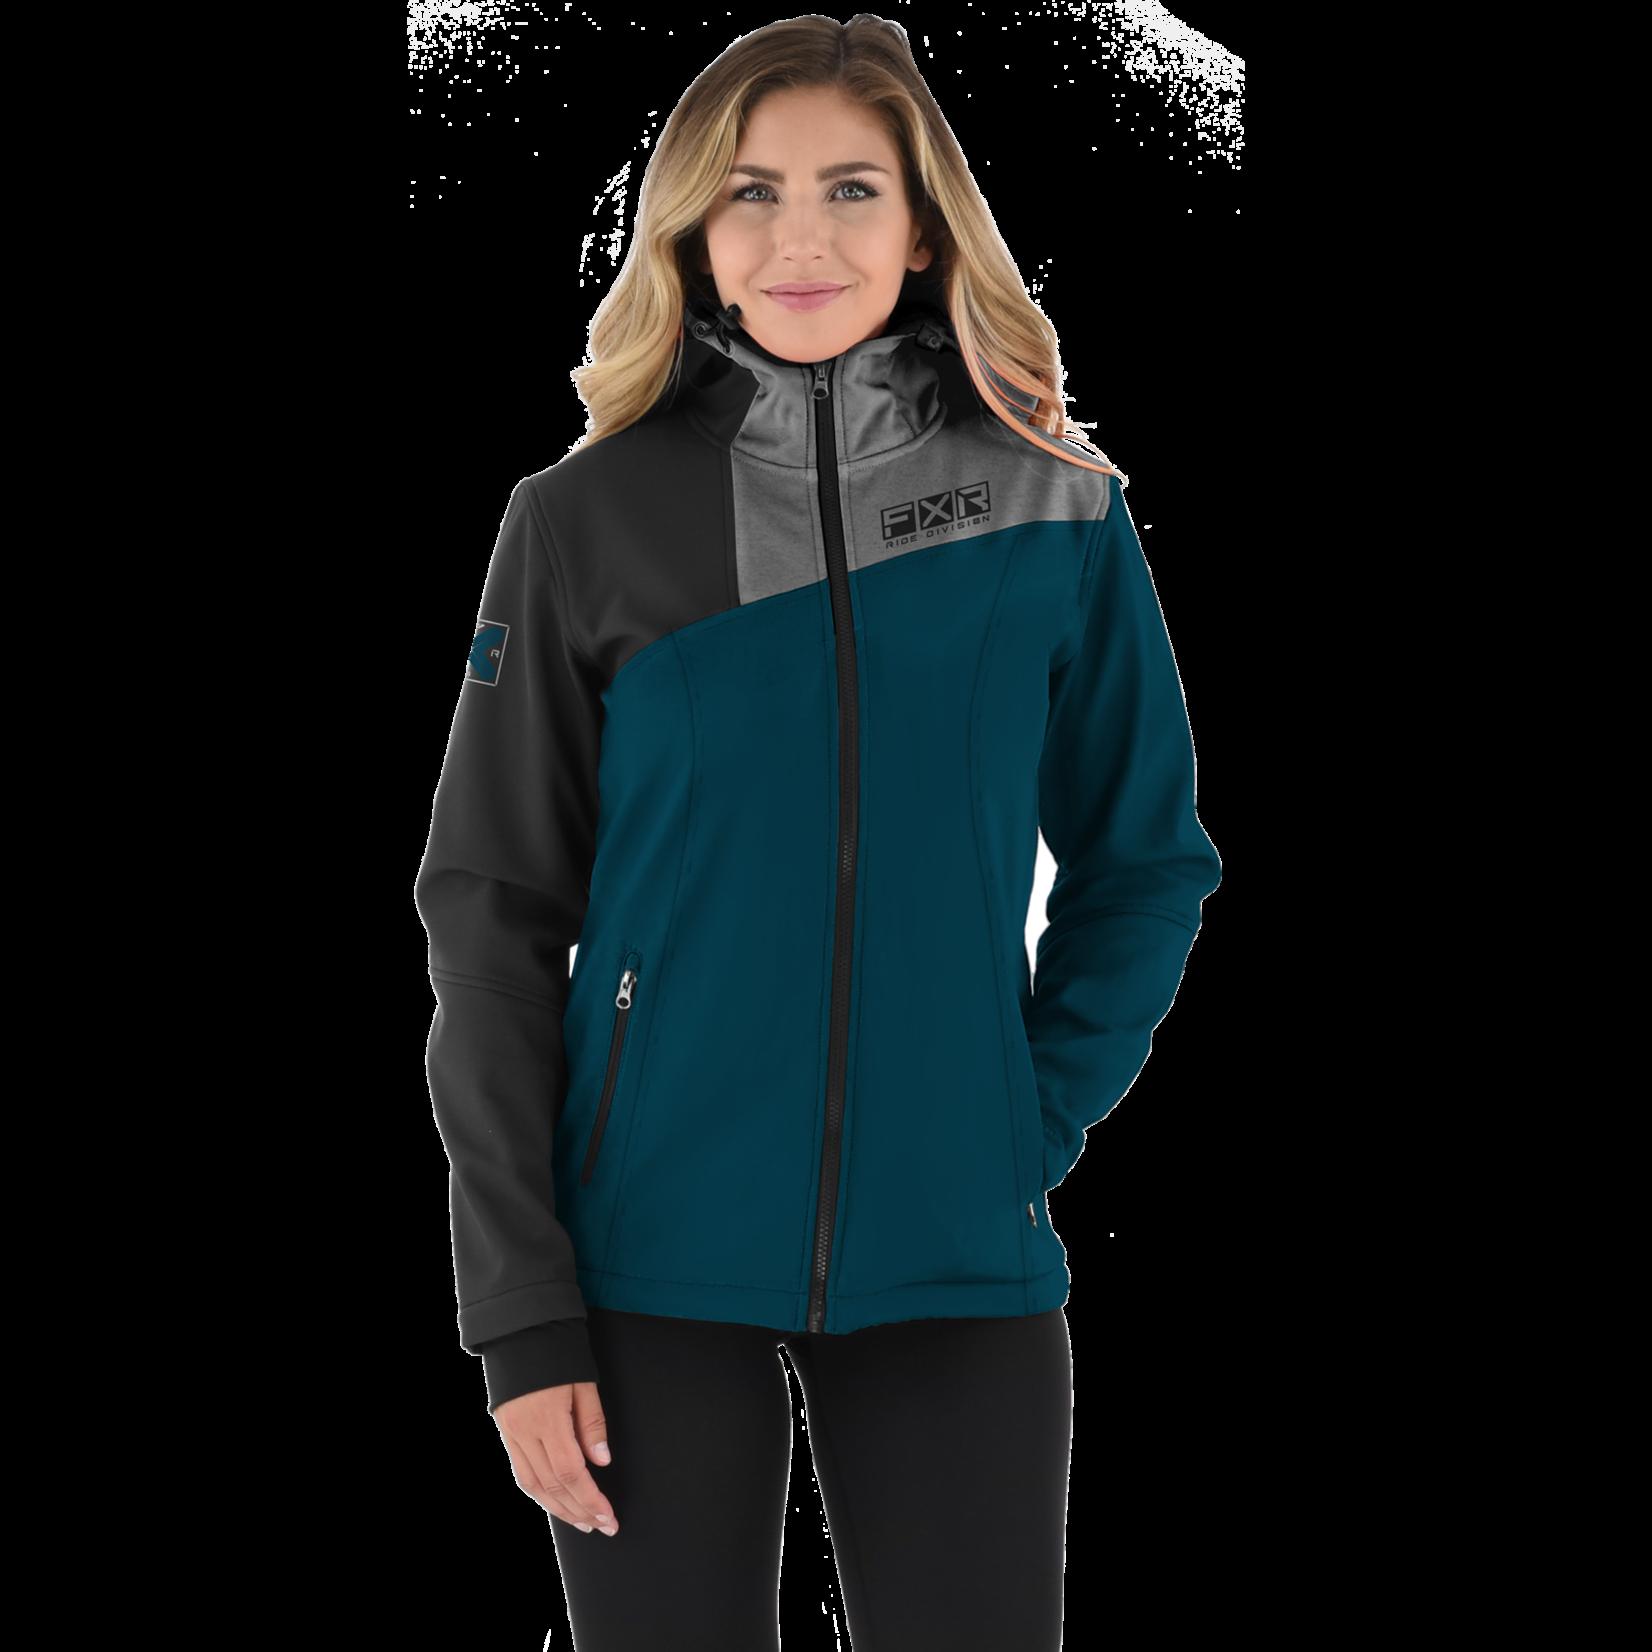 FXR FXR Women's Maverick Softshell Jacket